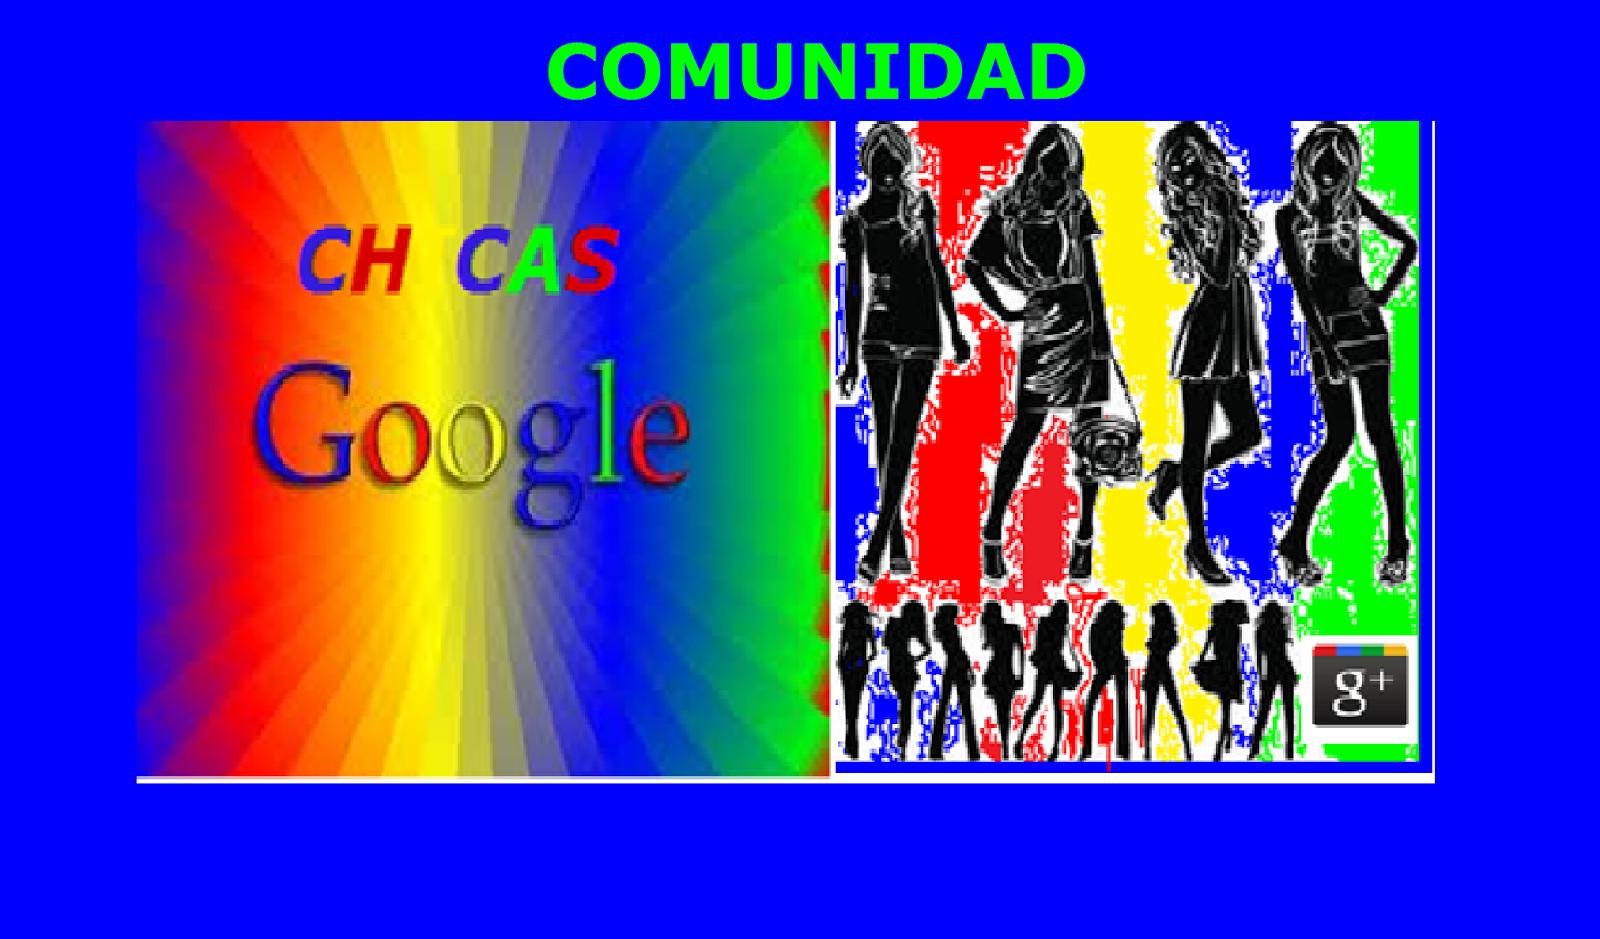 UNETE A LA COMUNIDAD CHICAS GOOGLE